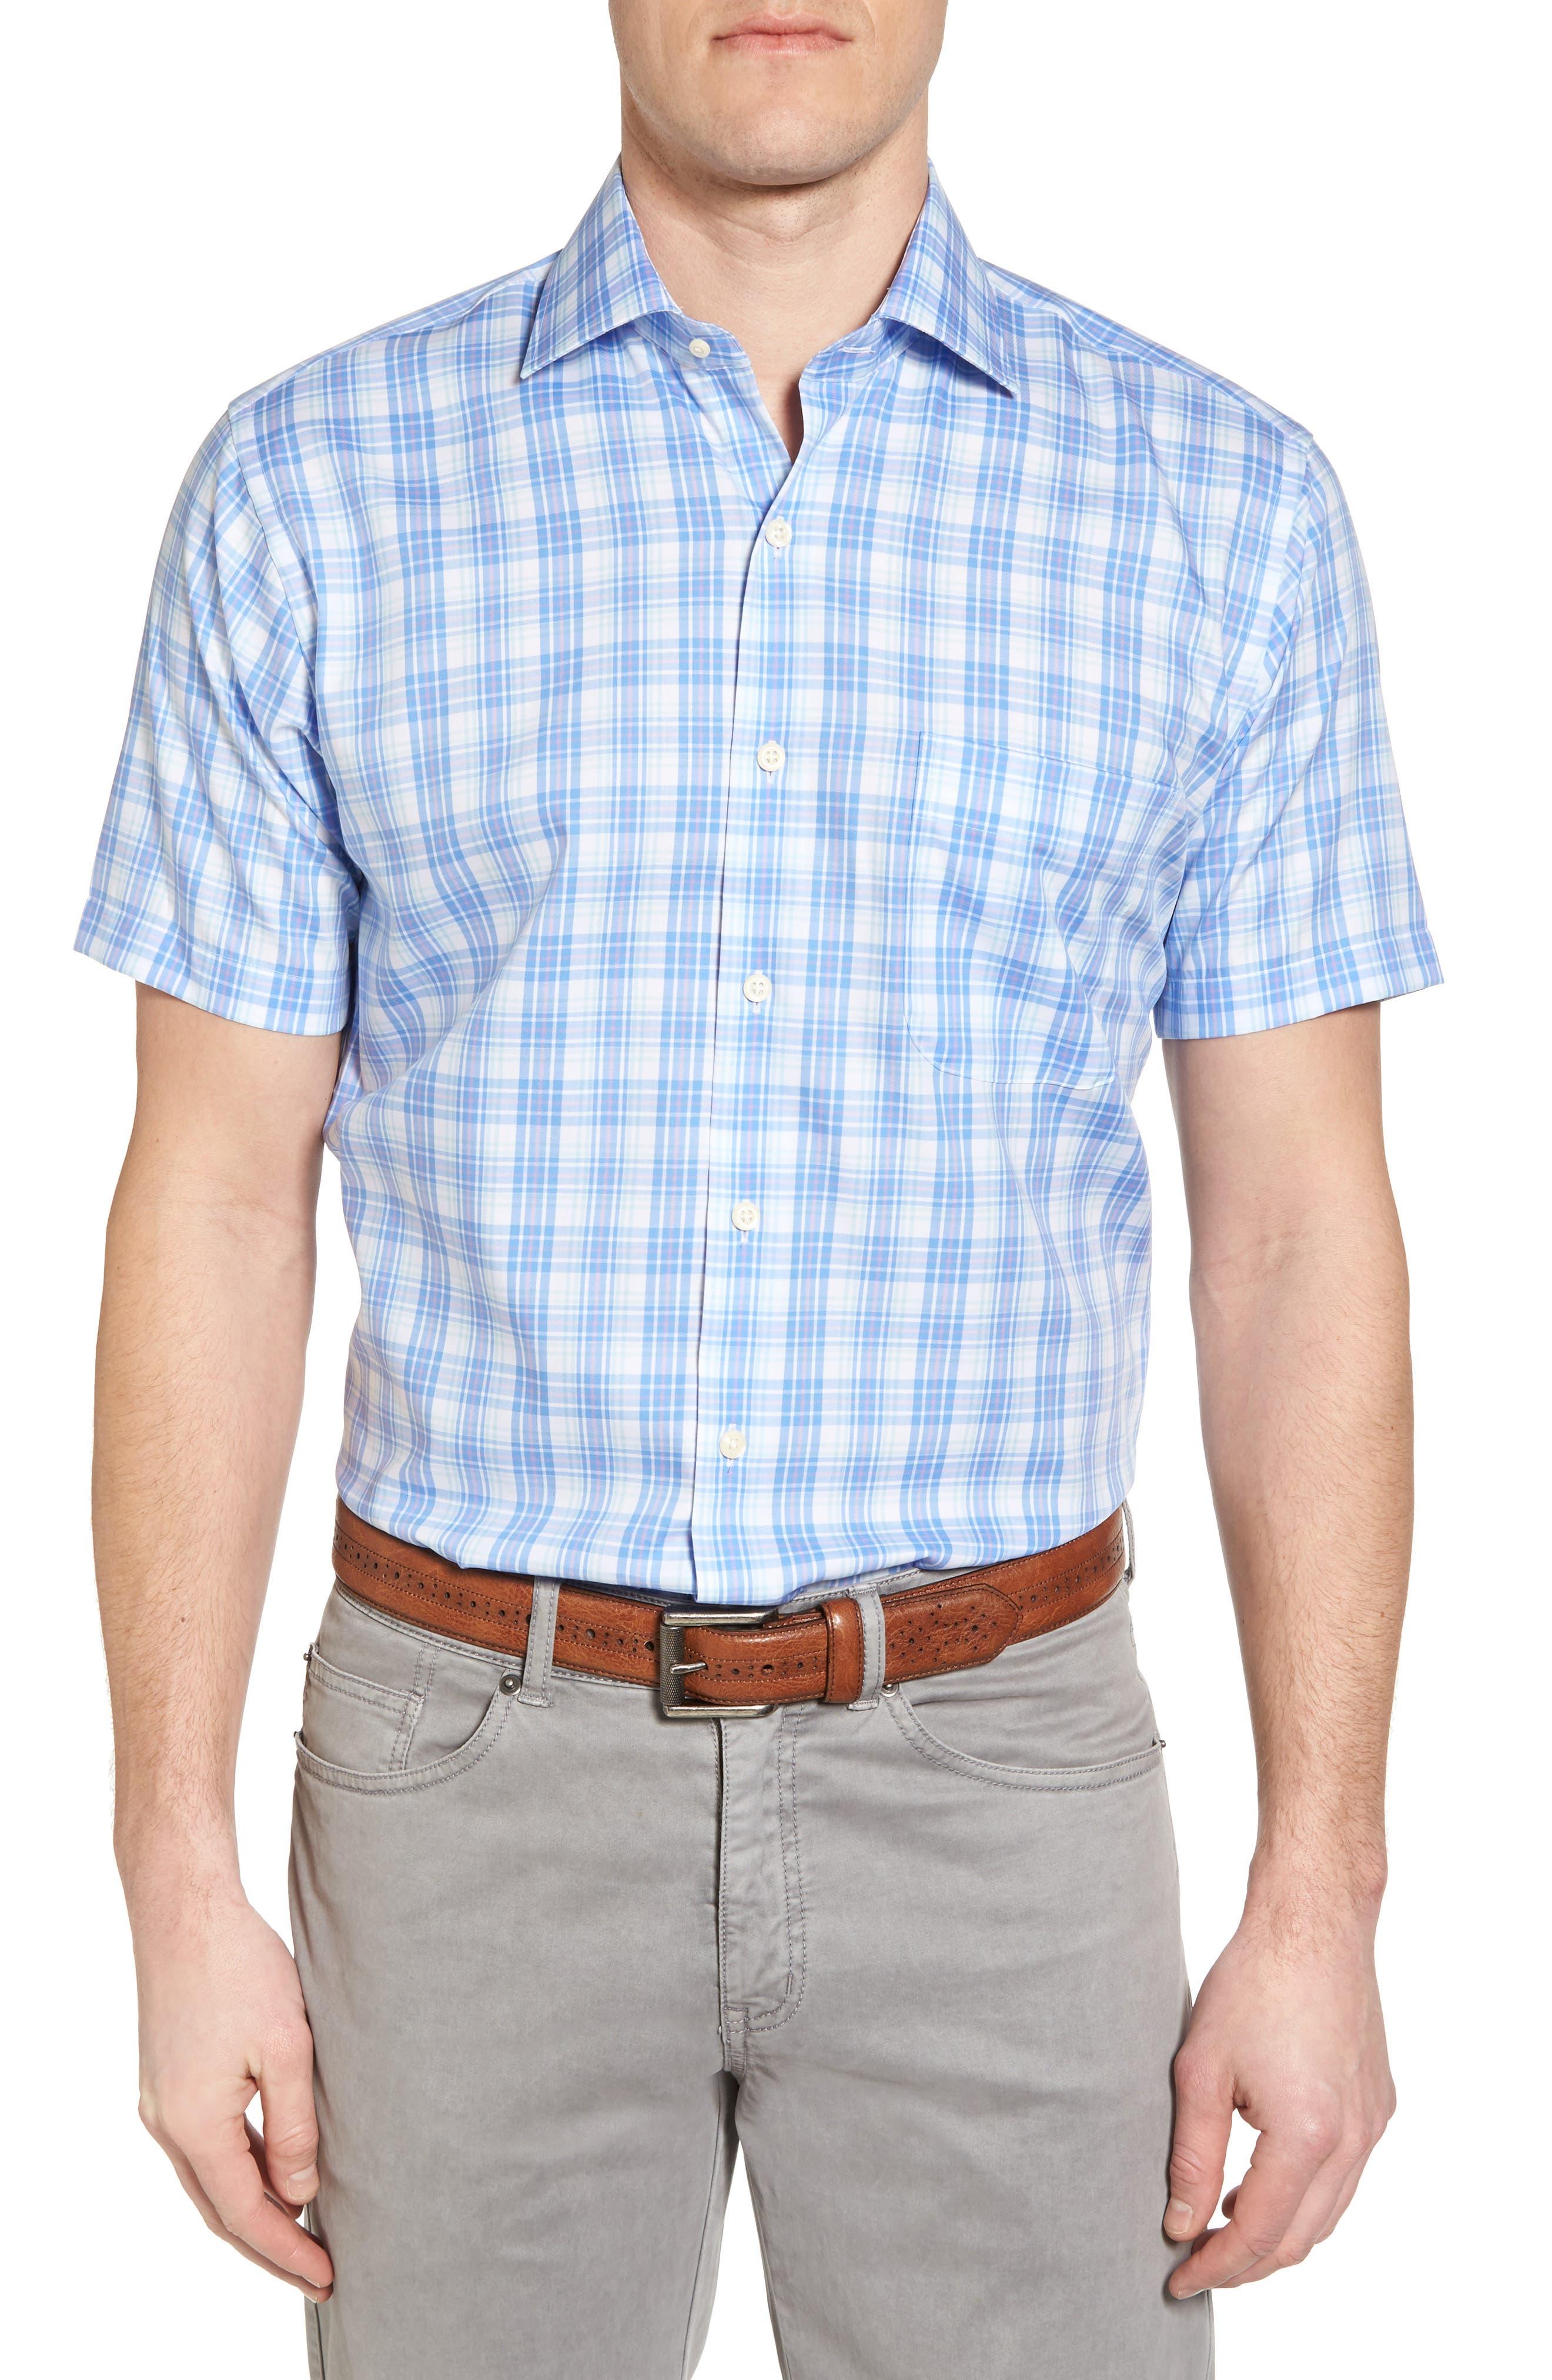 Crown Ease Sloan Regular Fit Plaid Sport Shirt,                             Main thumbnail 1, color,                             Atlas Blue